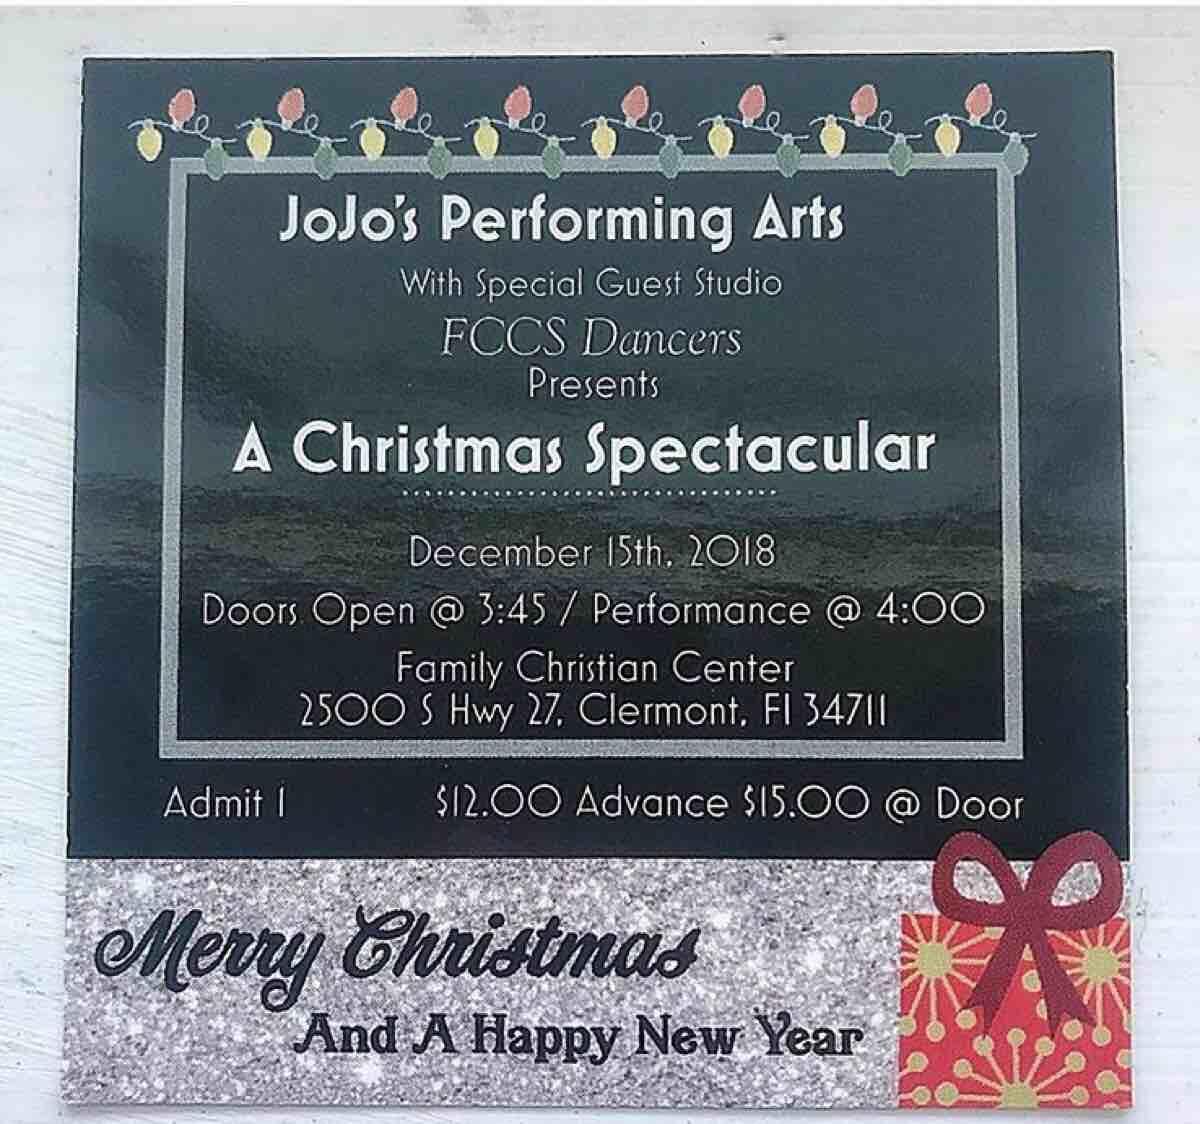 Dec 15 Jojos Performing Arts Christmas Spectacular Nextdoor